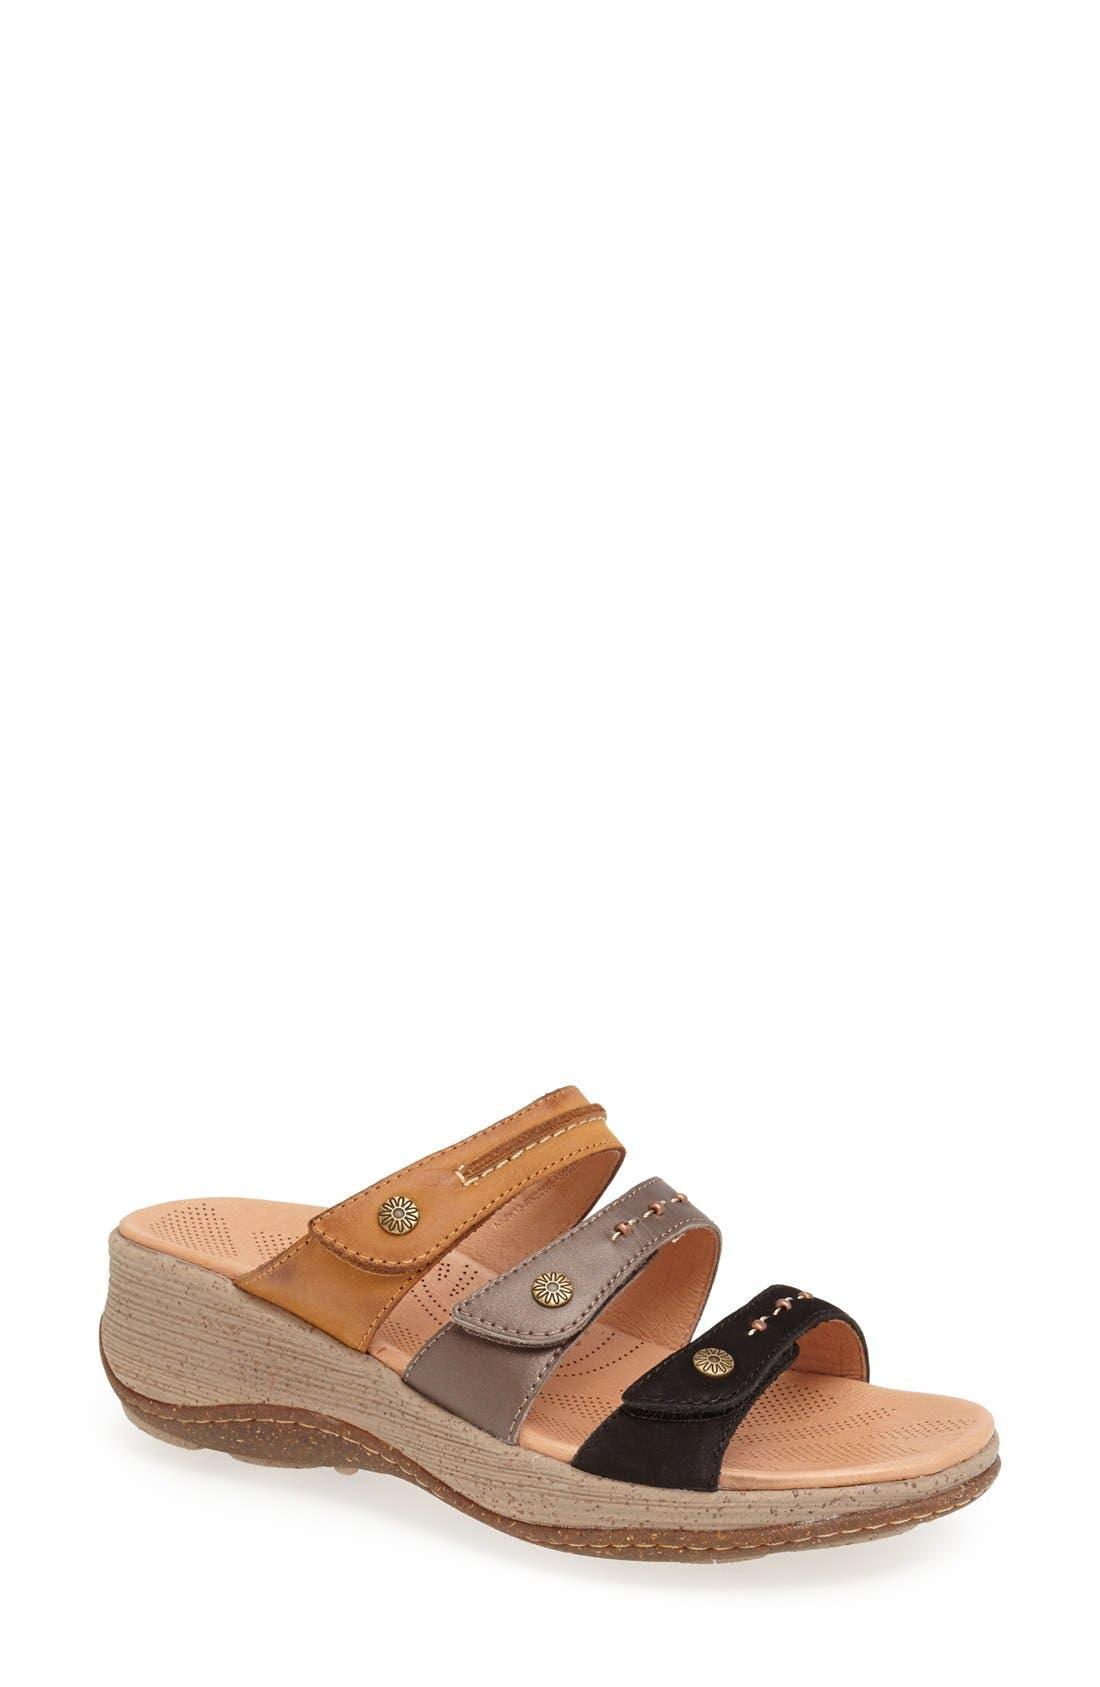 Main Image - Acorn 'Vista' Wedge Sandal (Women)